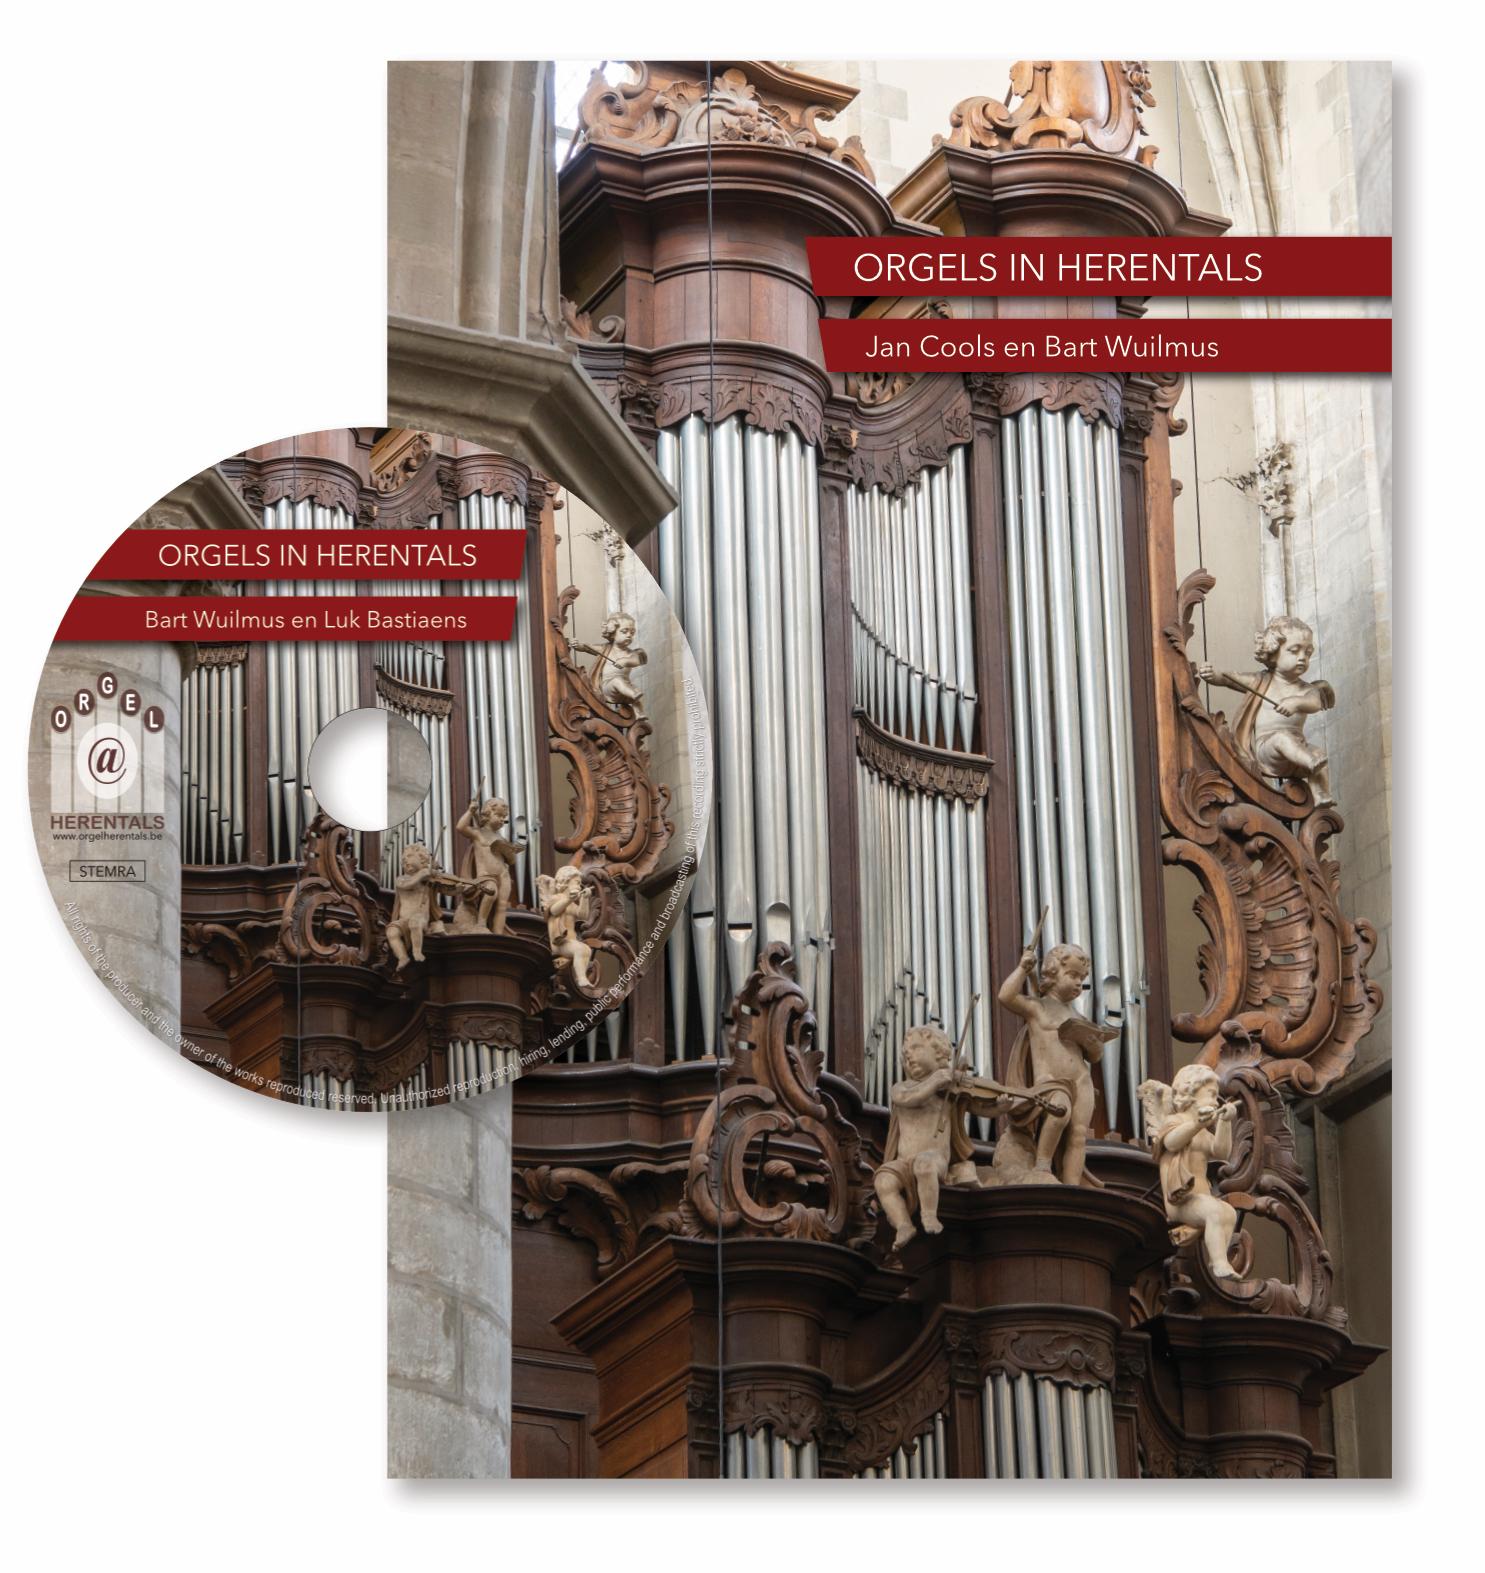 Orgels in Herentals